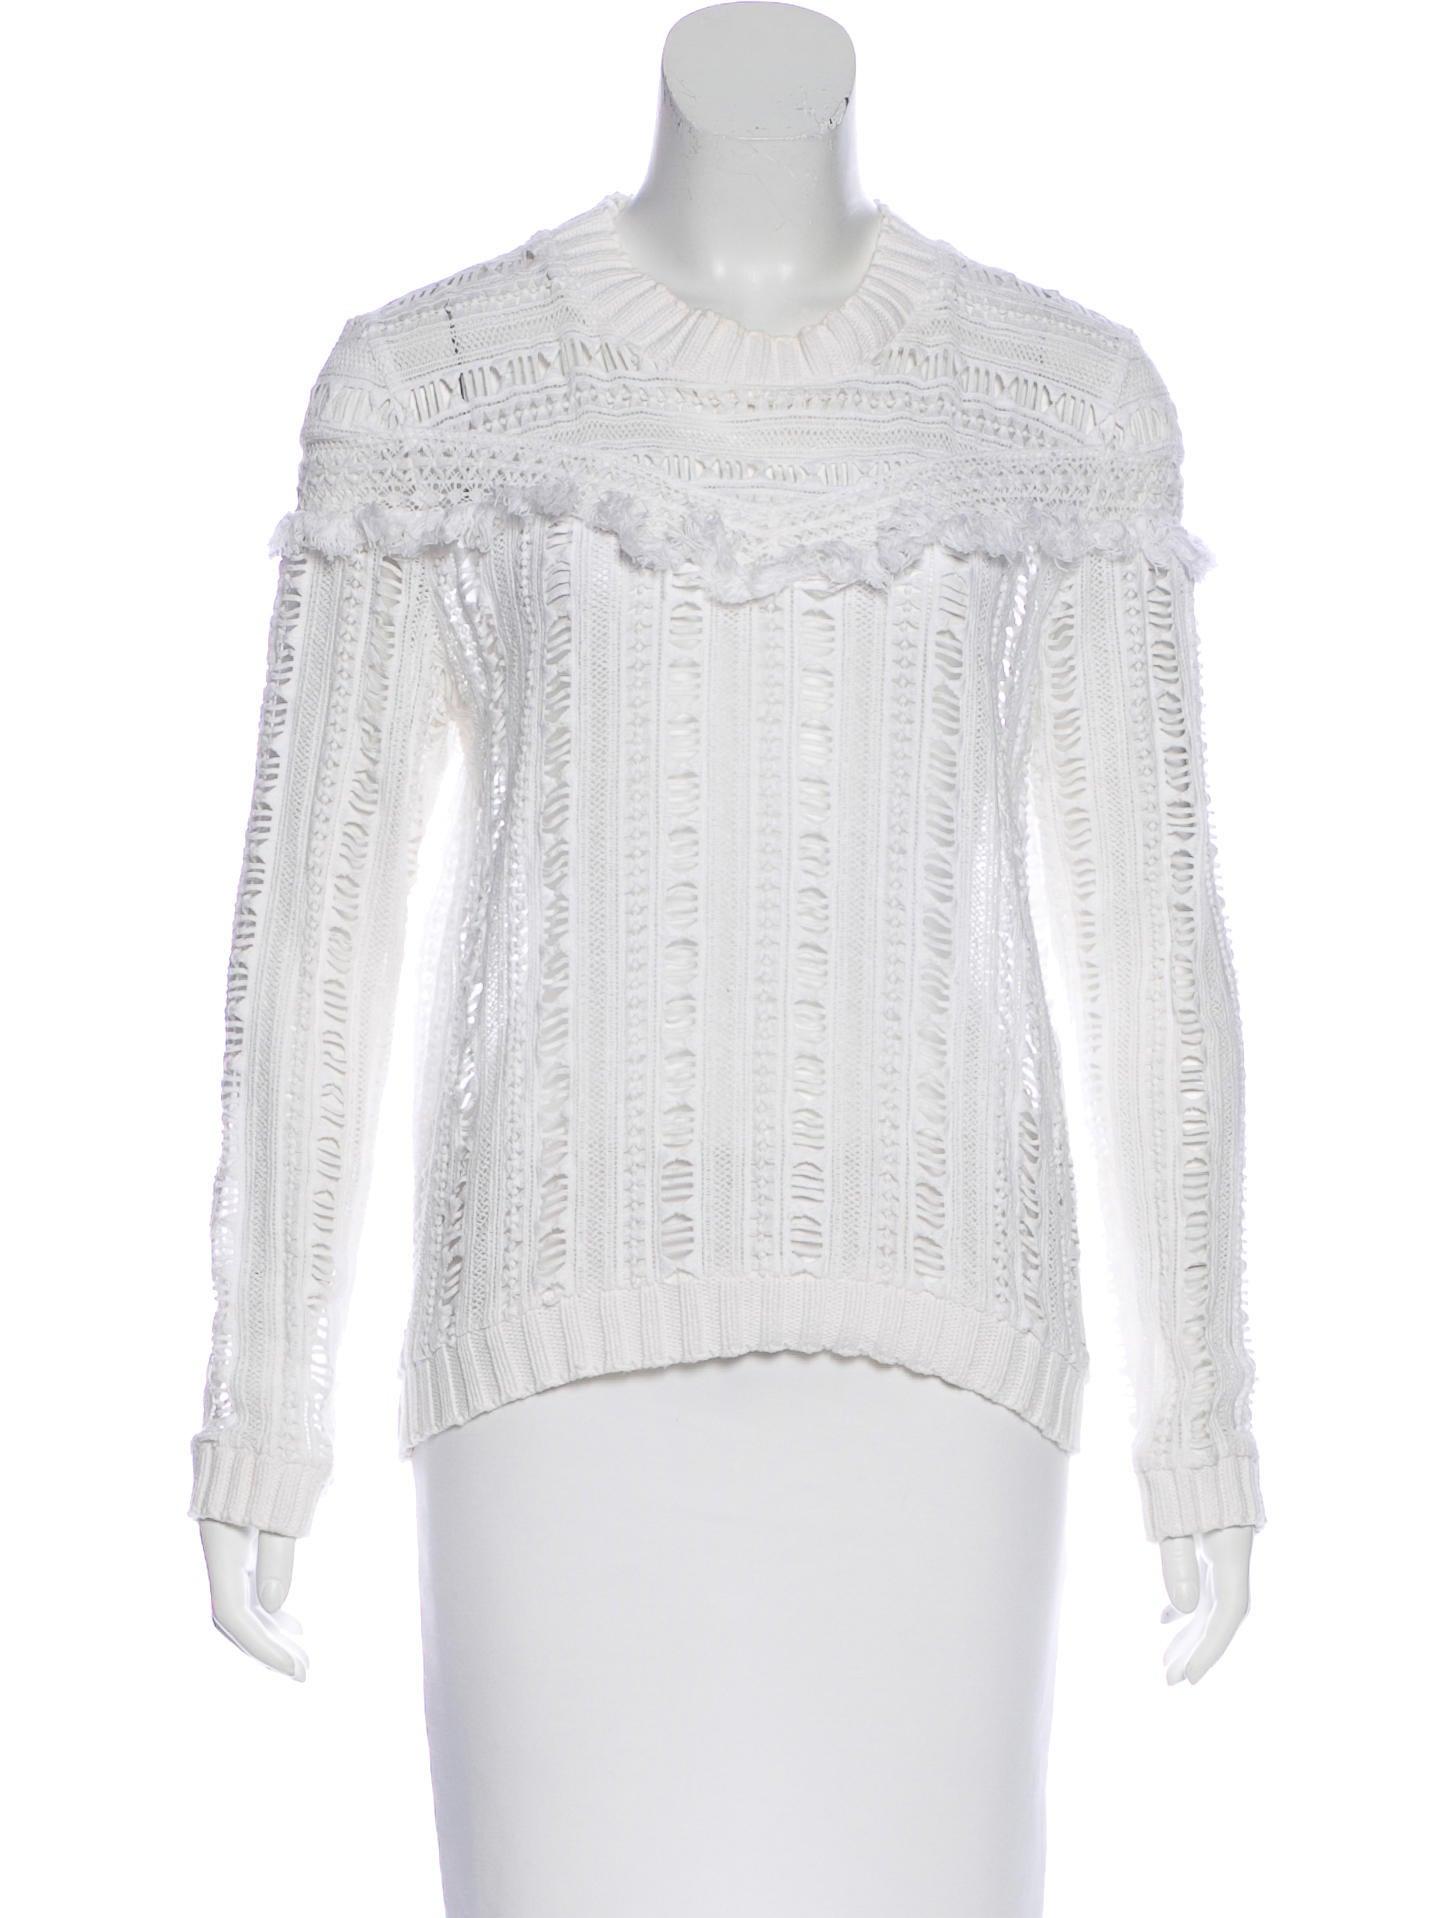 Sea Long Sleeve Open Knit Sweater - Clothing - WSSEA23622 | The ...